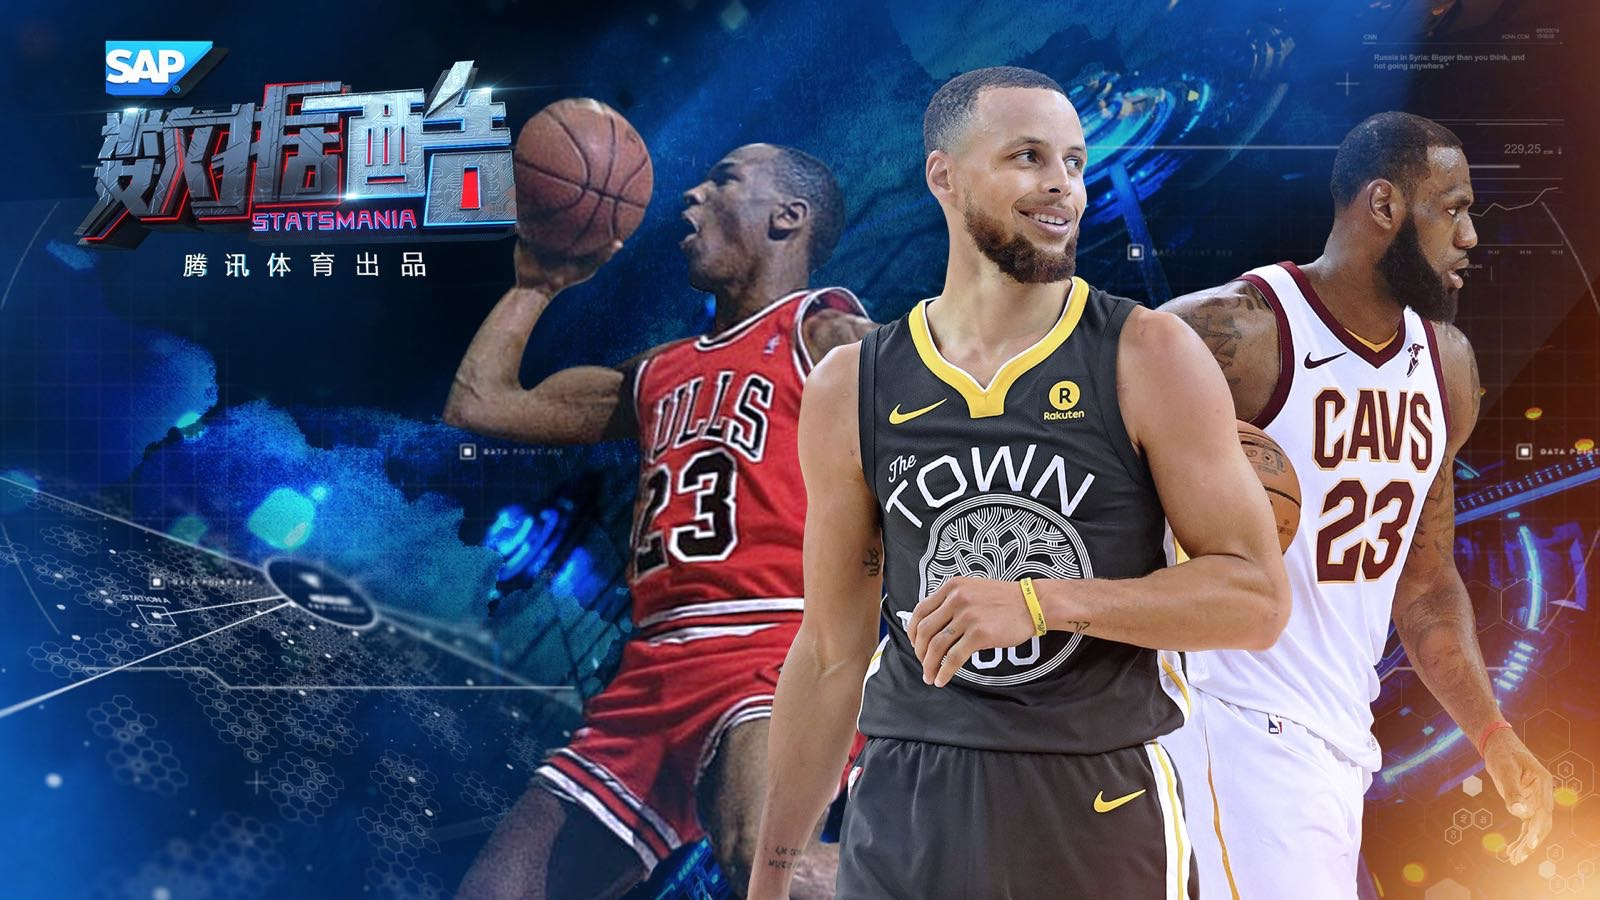 《NBA数据酷》第13期:表现逆天仍孤詹难支 大数据显示骑士逆转成功概率仅6.7%